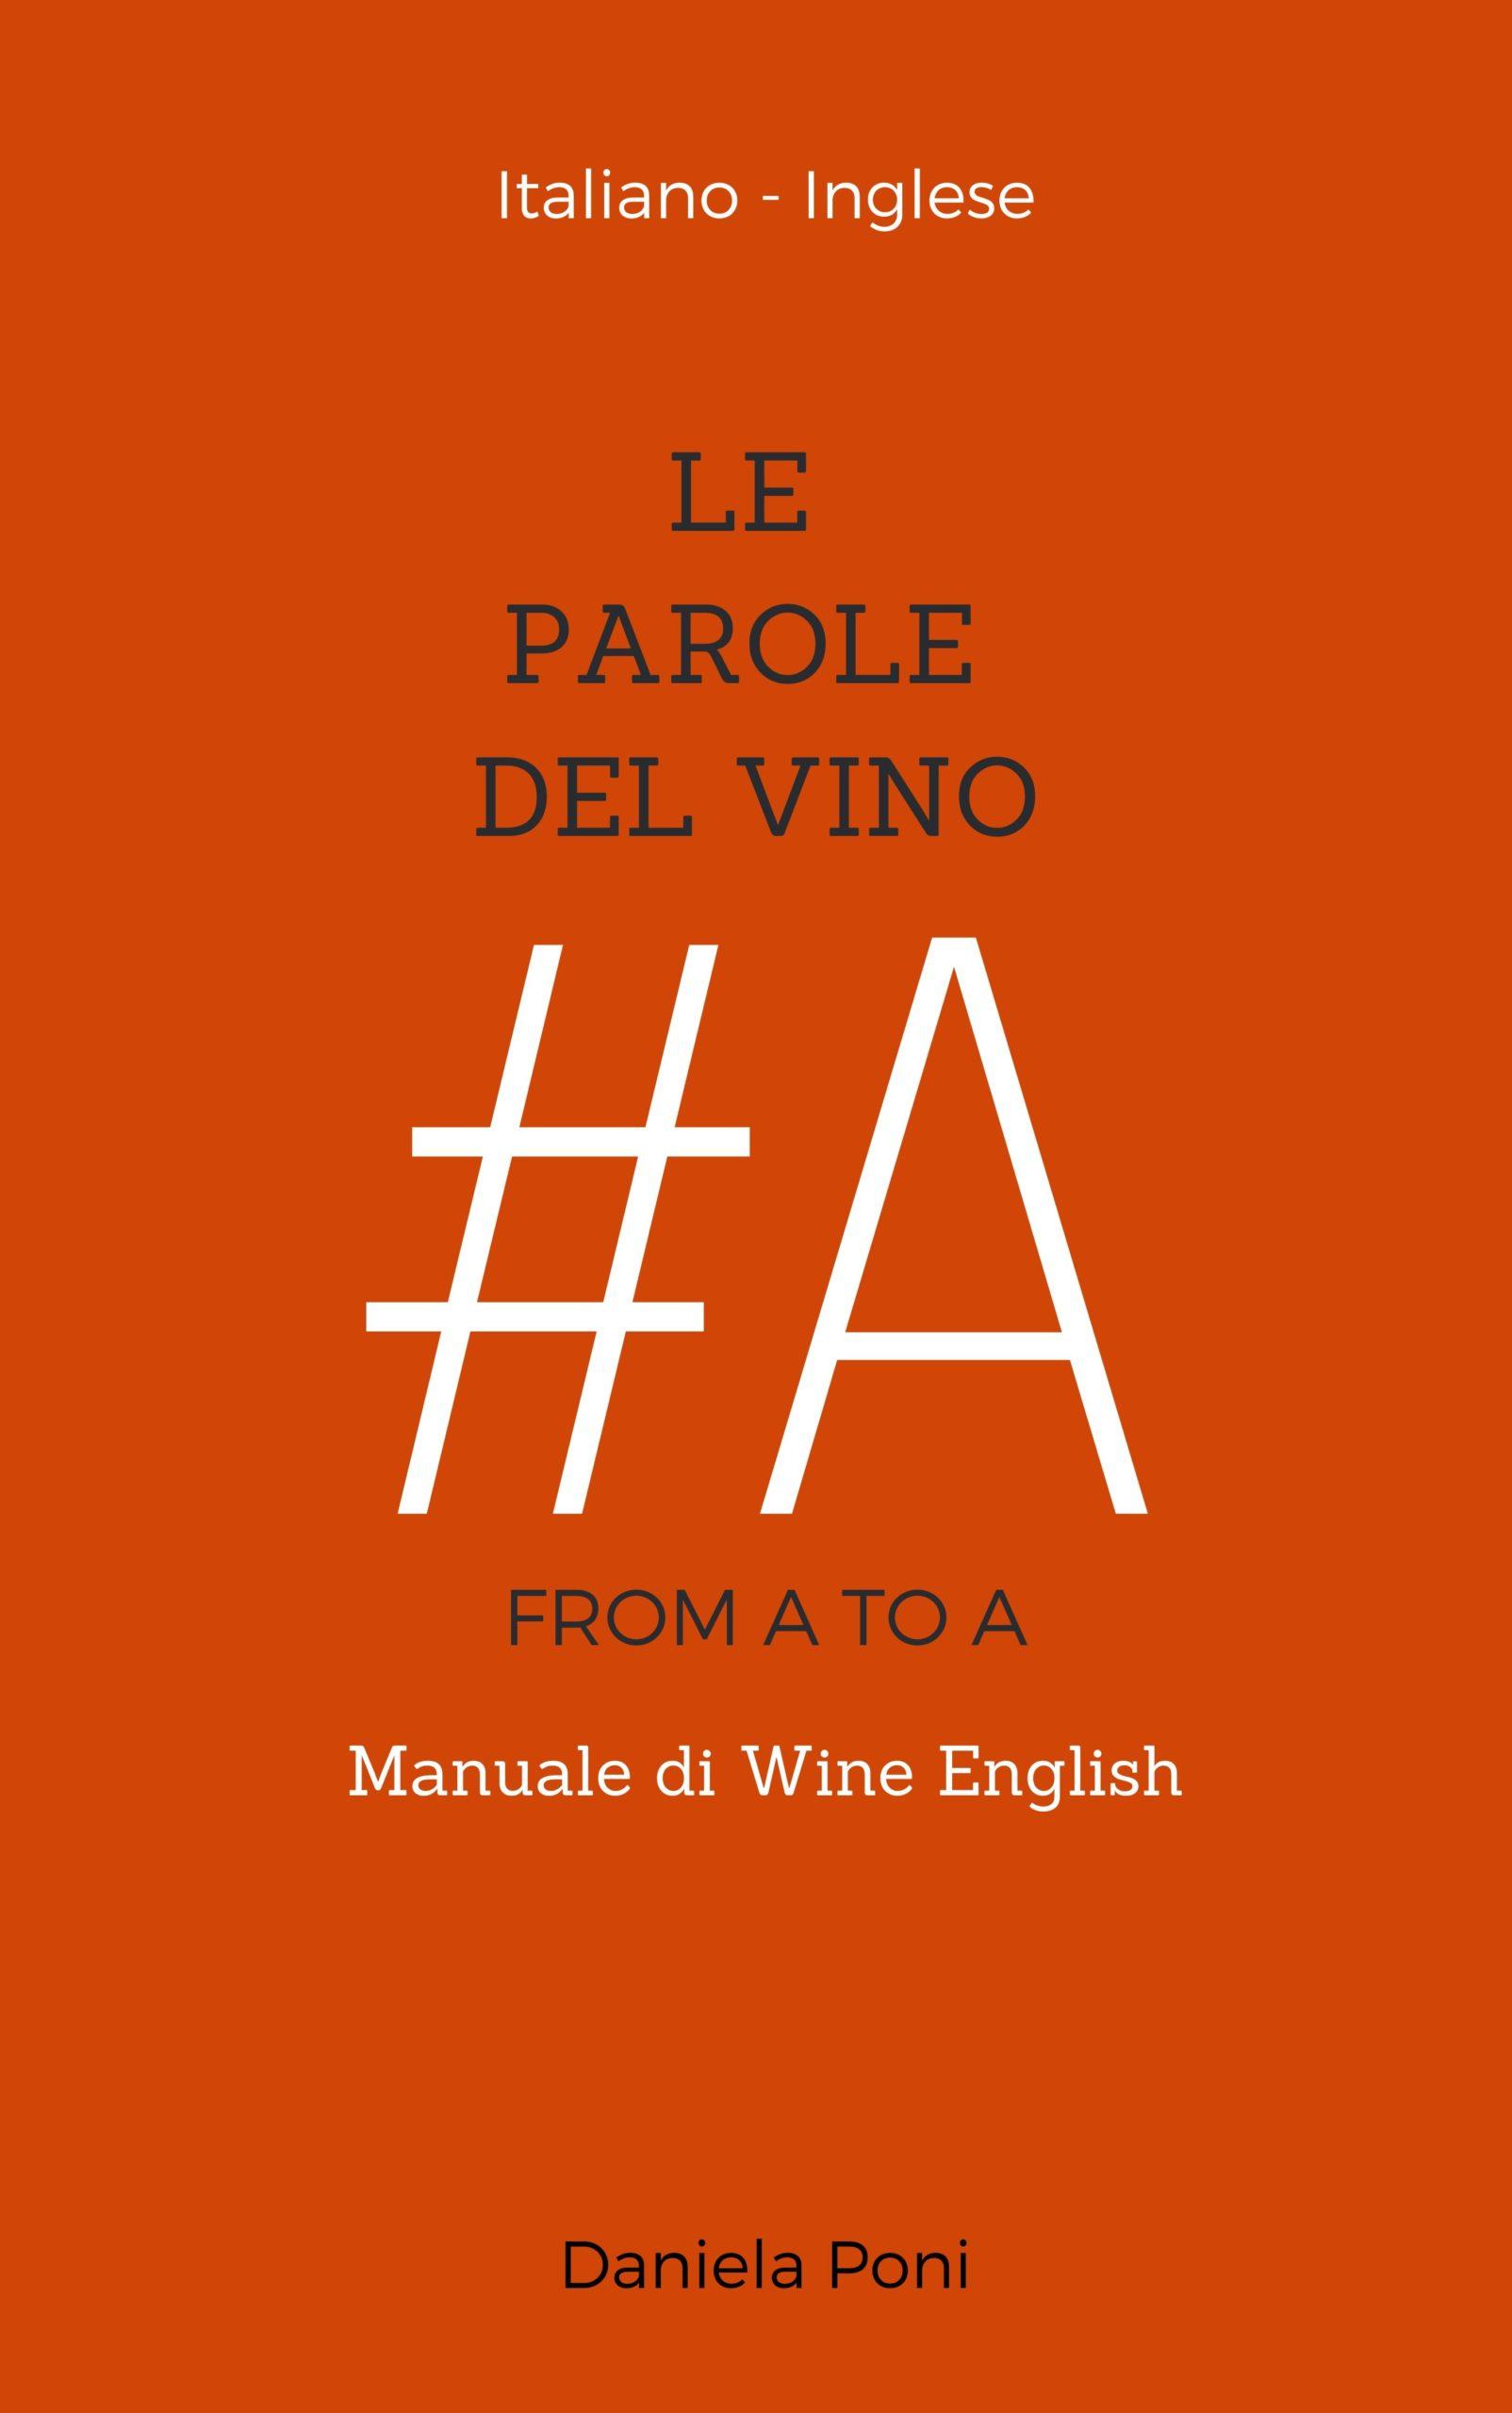 Inglese tecnico vino italiano - inglese